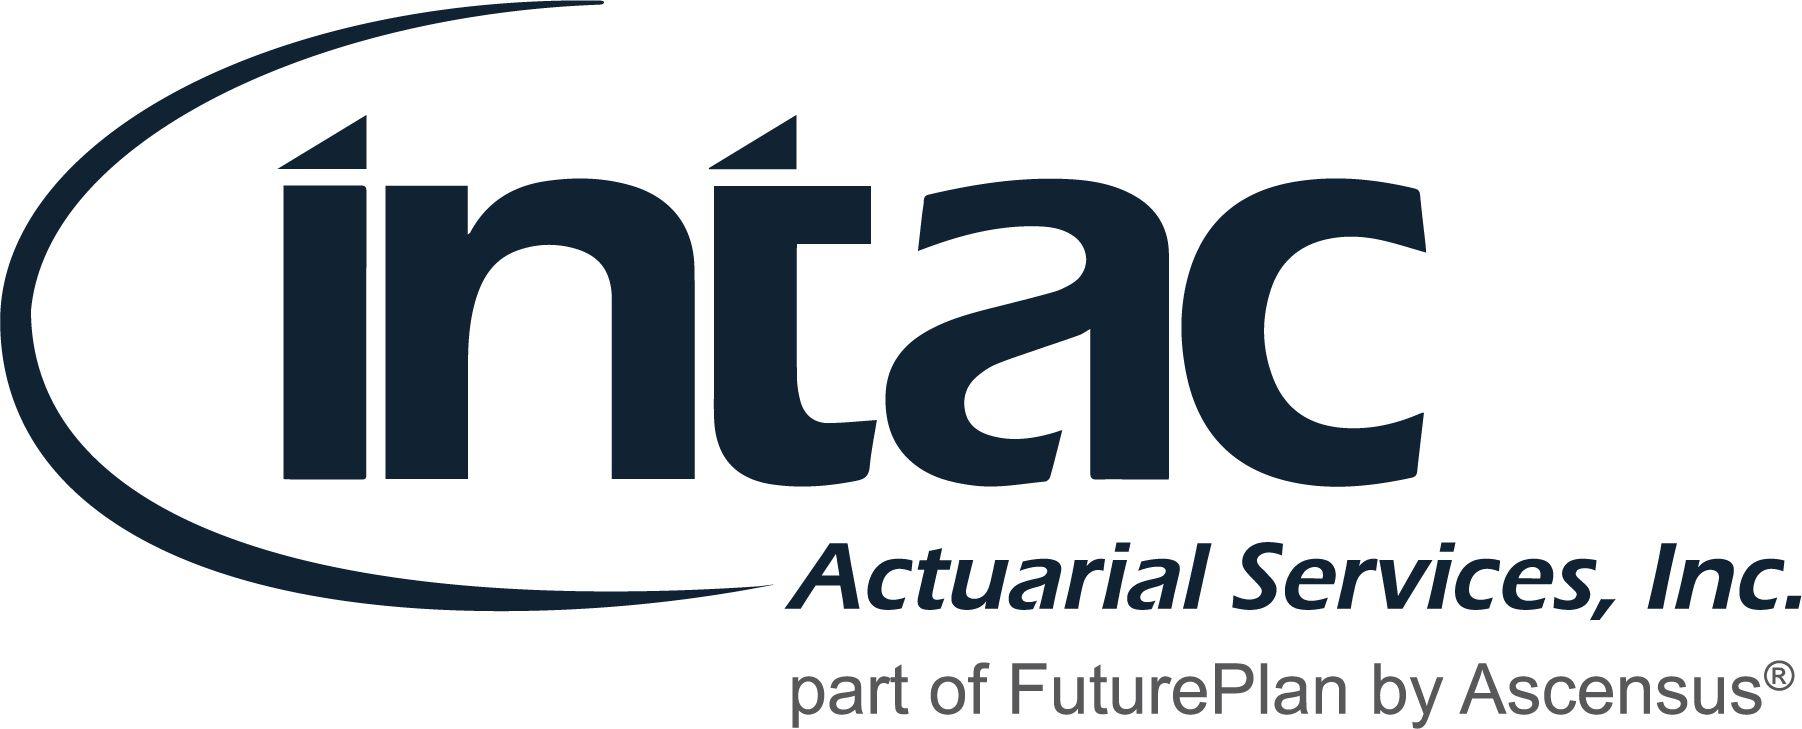 Intac Actuarial Services, Inc., part of FuturePlan